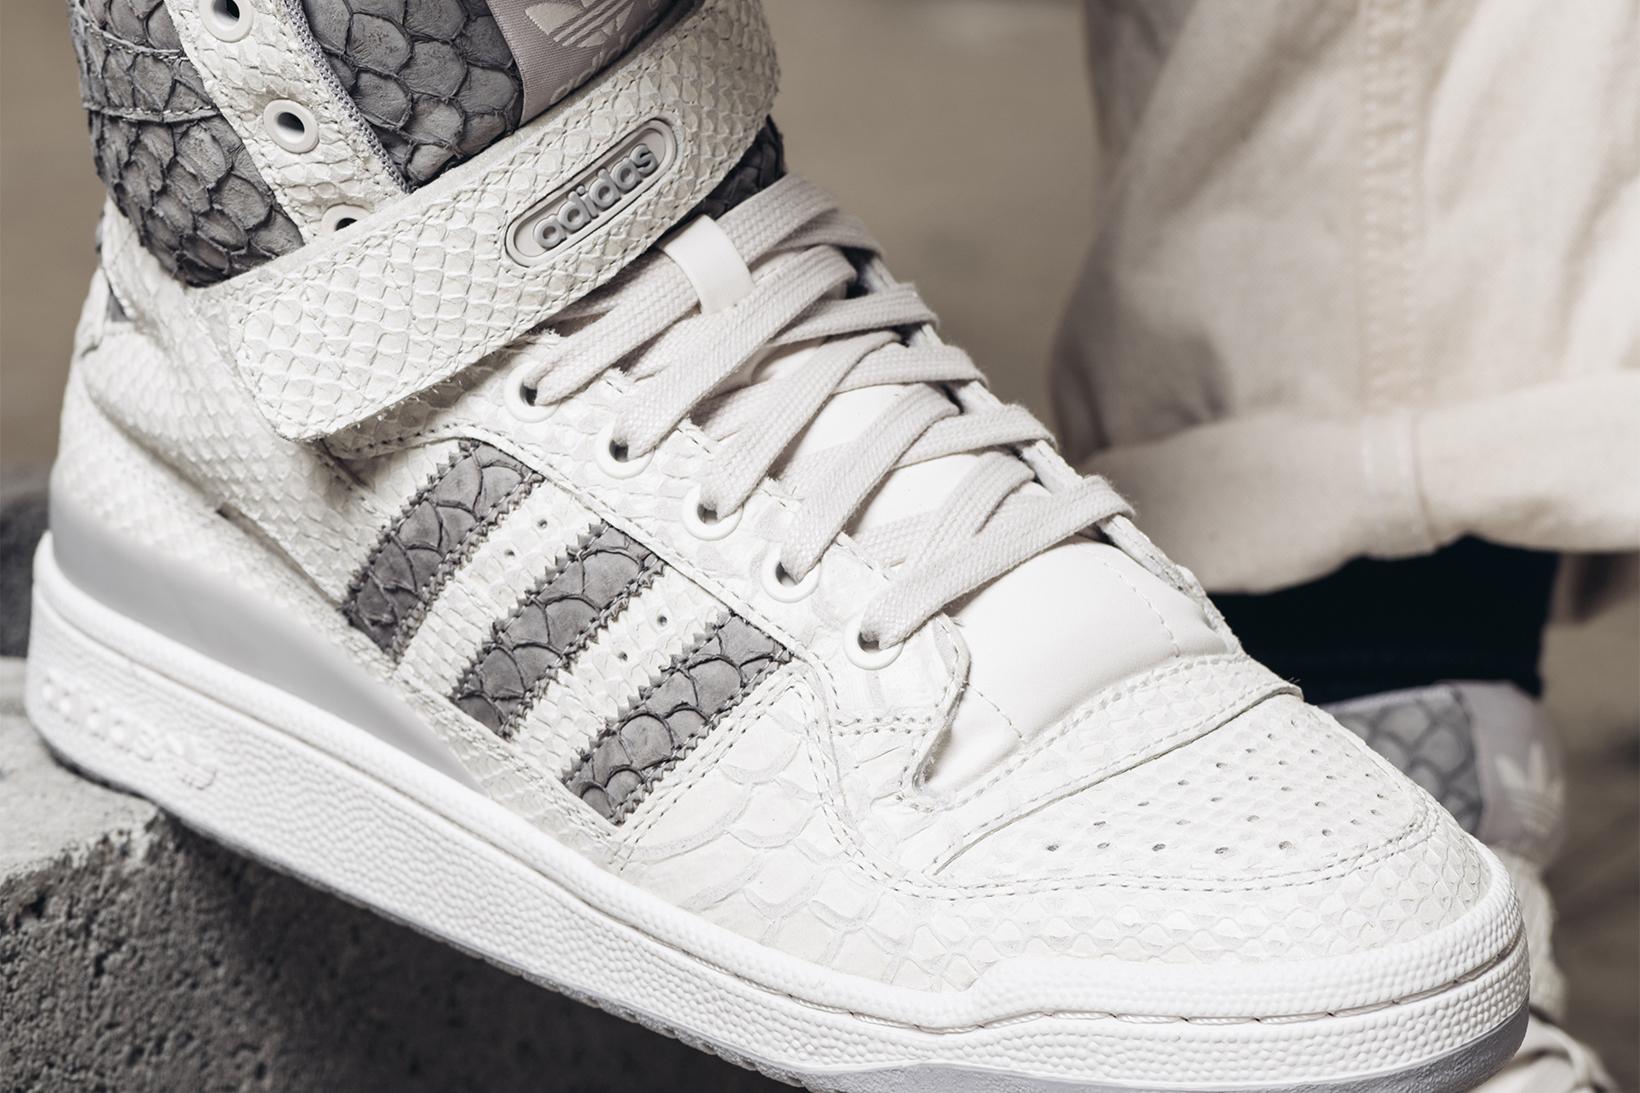 adidas Originals Is Set to Relaunch the Forum